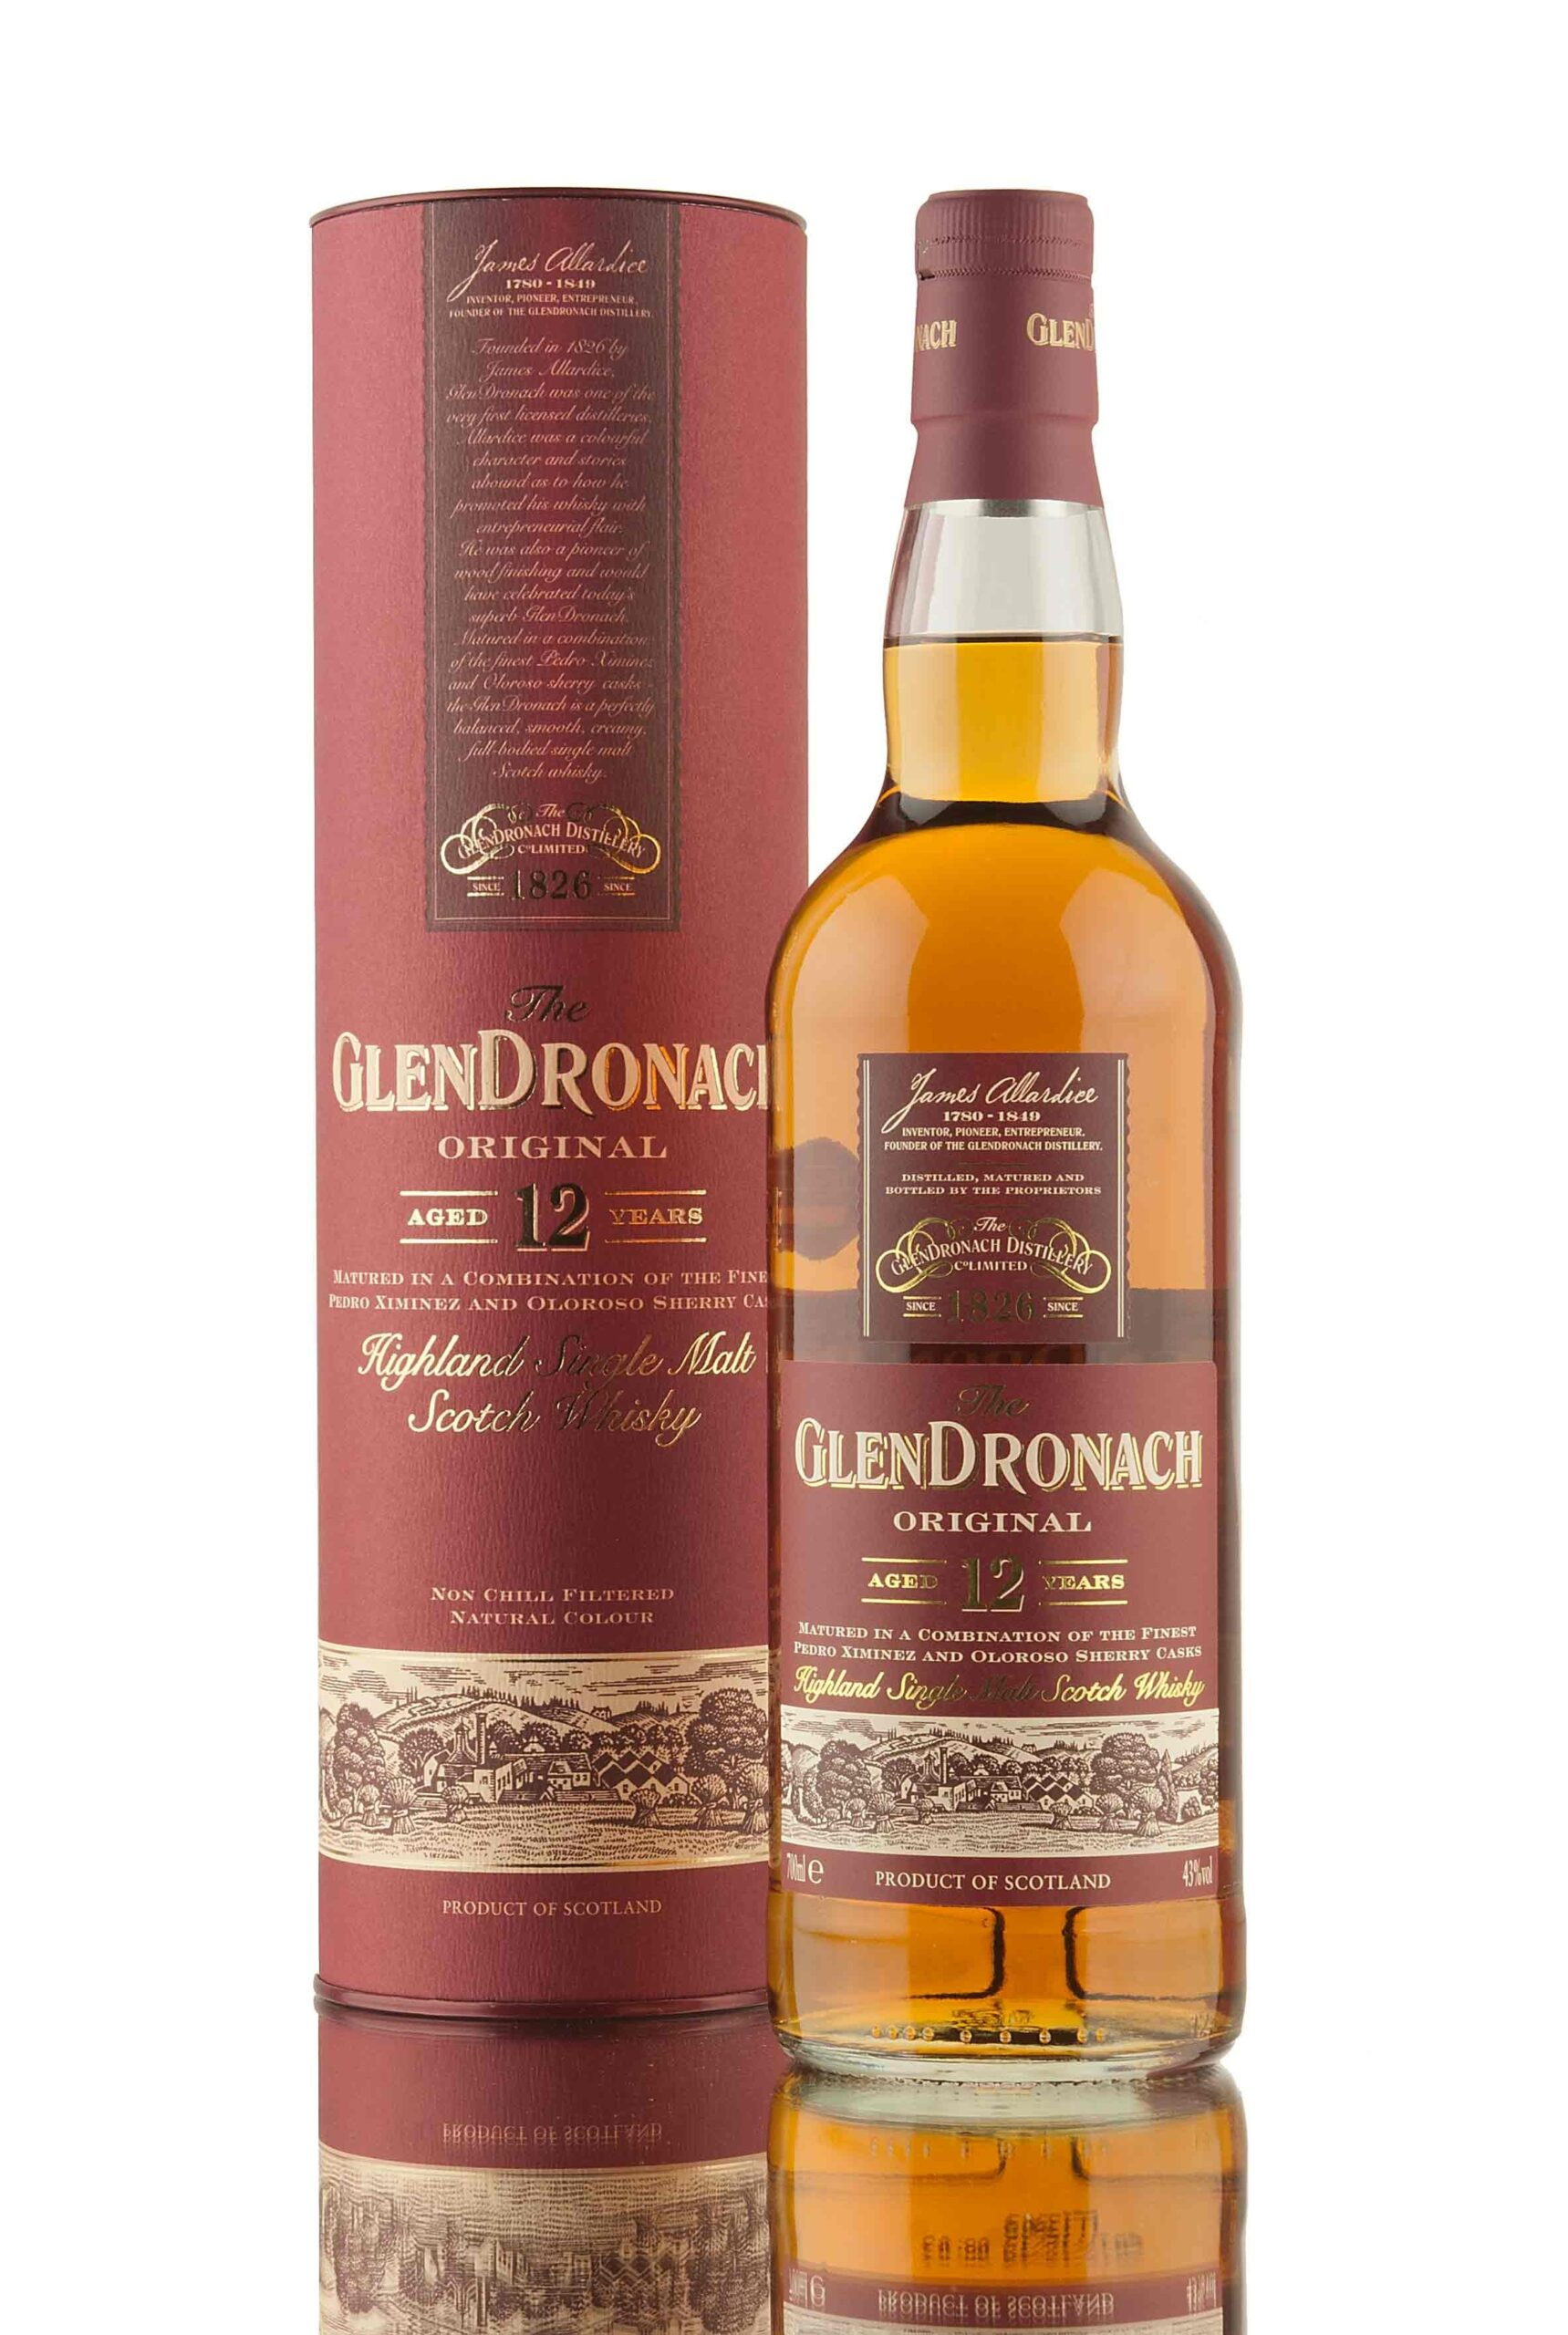 Glendronach Original, 12 Year Sherry Bomb